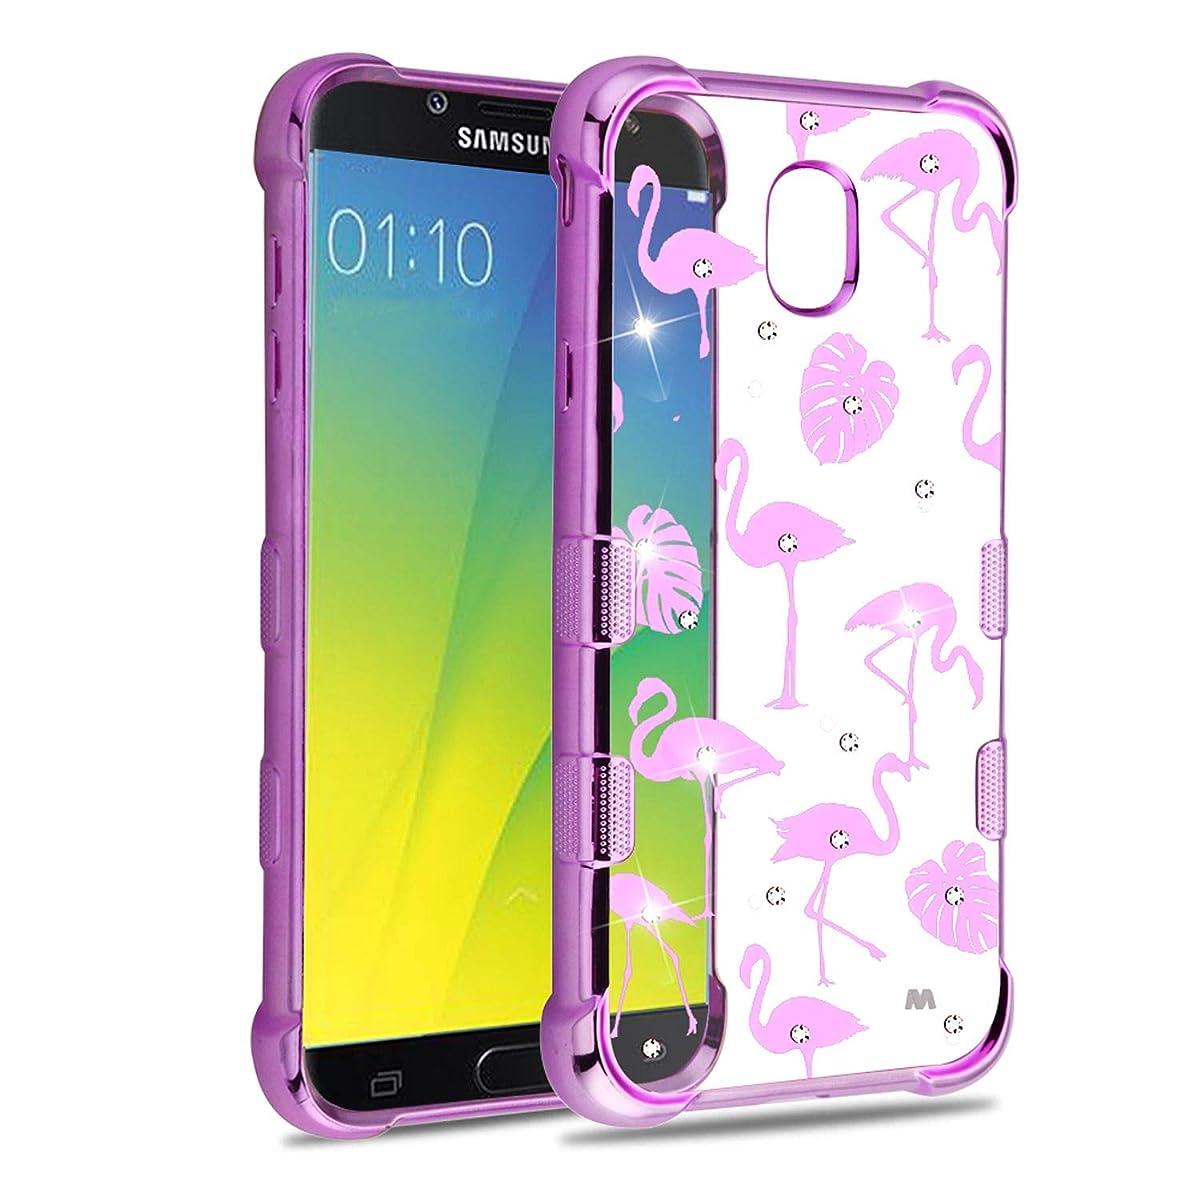 Insten Tuff Klarity Flamingo PC/TPU Rubber Case Cover with Diamond Compatible with Samsung Galaxy J7 (2018)/J7 Refine/J7 Star/J7 V 2nd Gen (2018), Clear/Purple